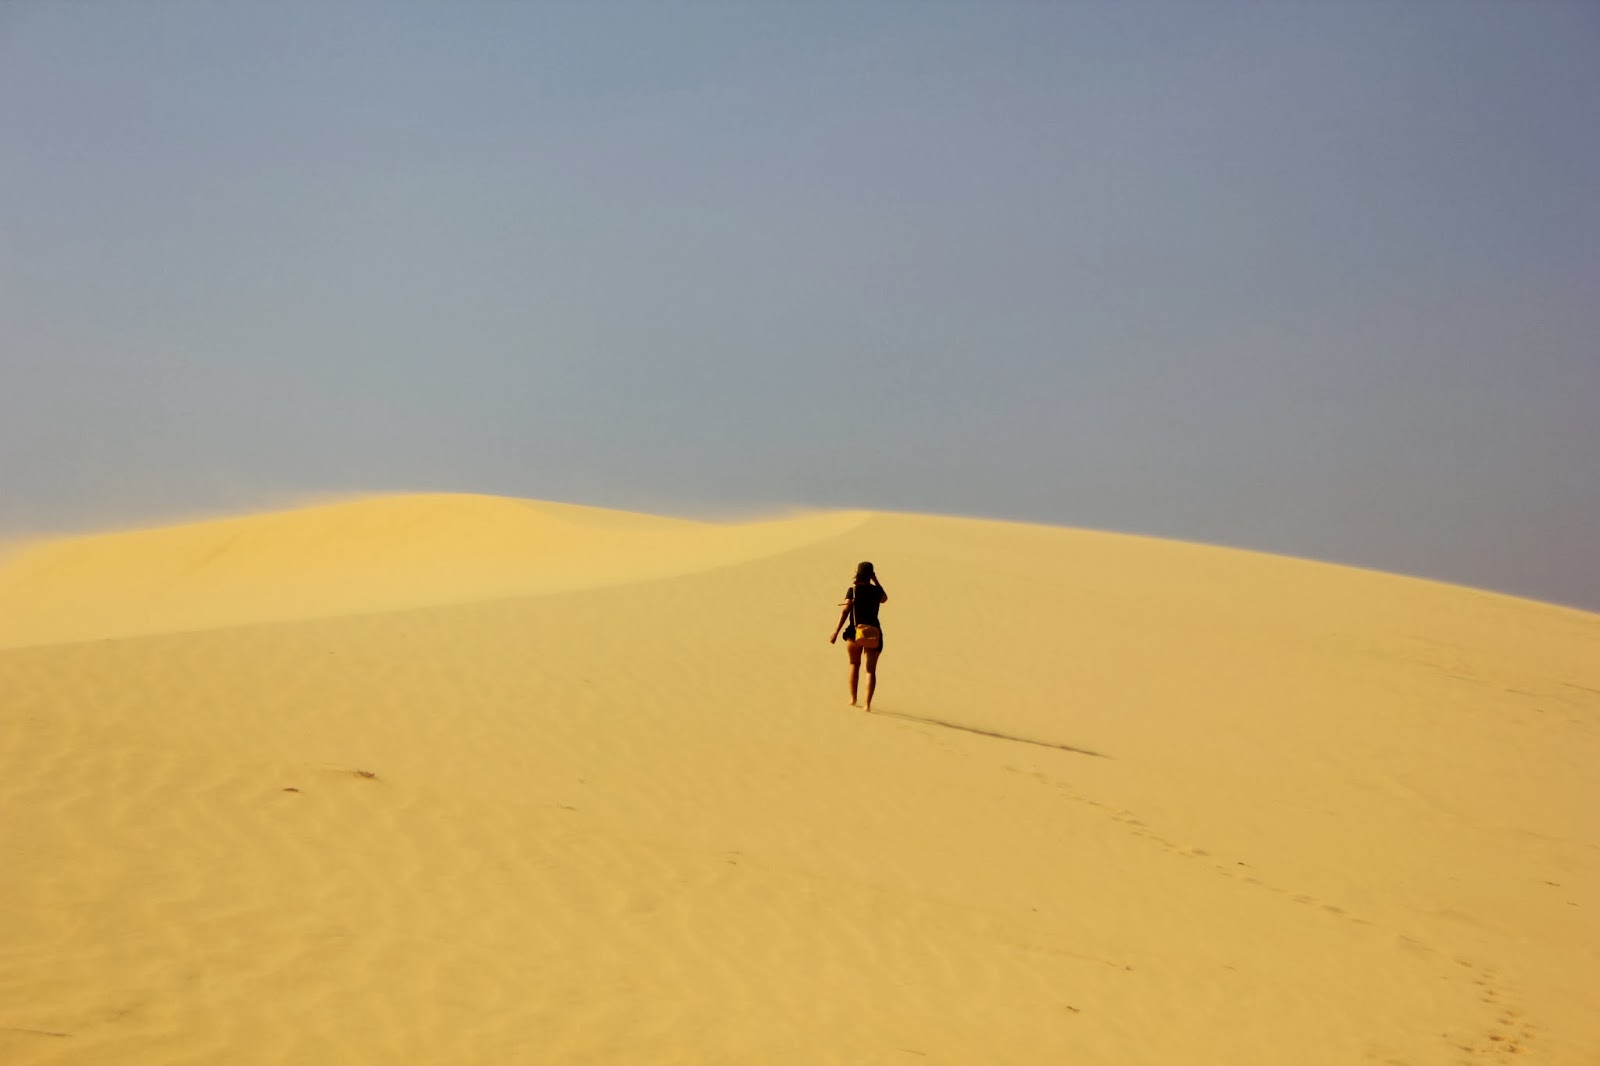 Sulle dune del deserto bianco a Mui Ne, Vietnam - foto di Elisa Chisana Hoshi